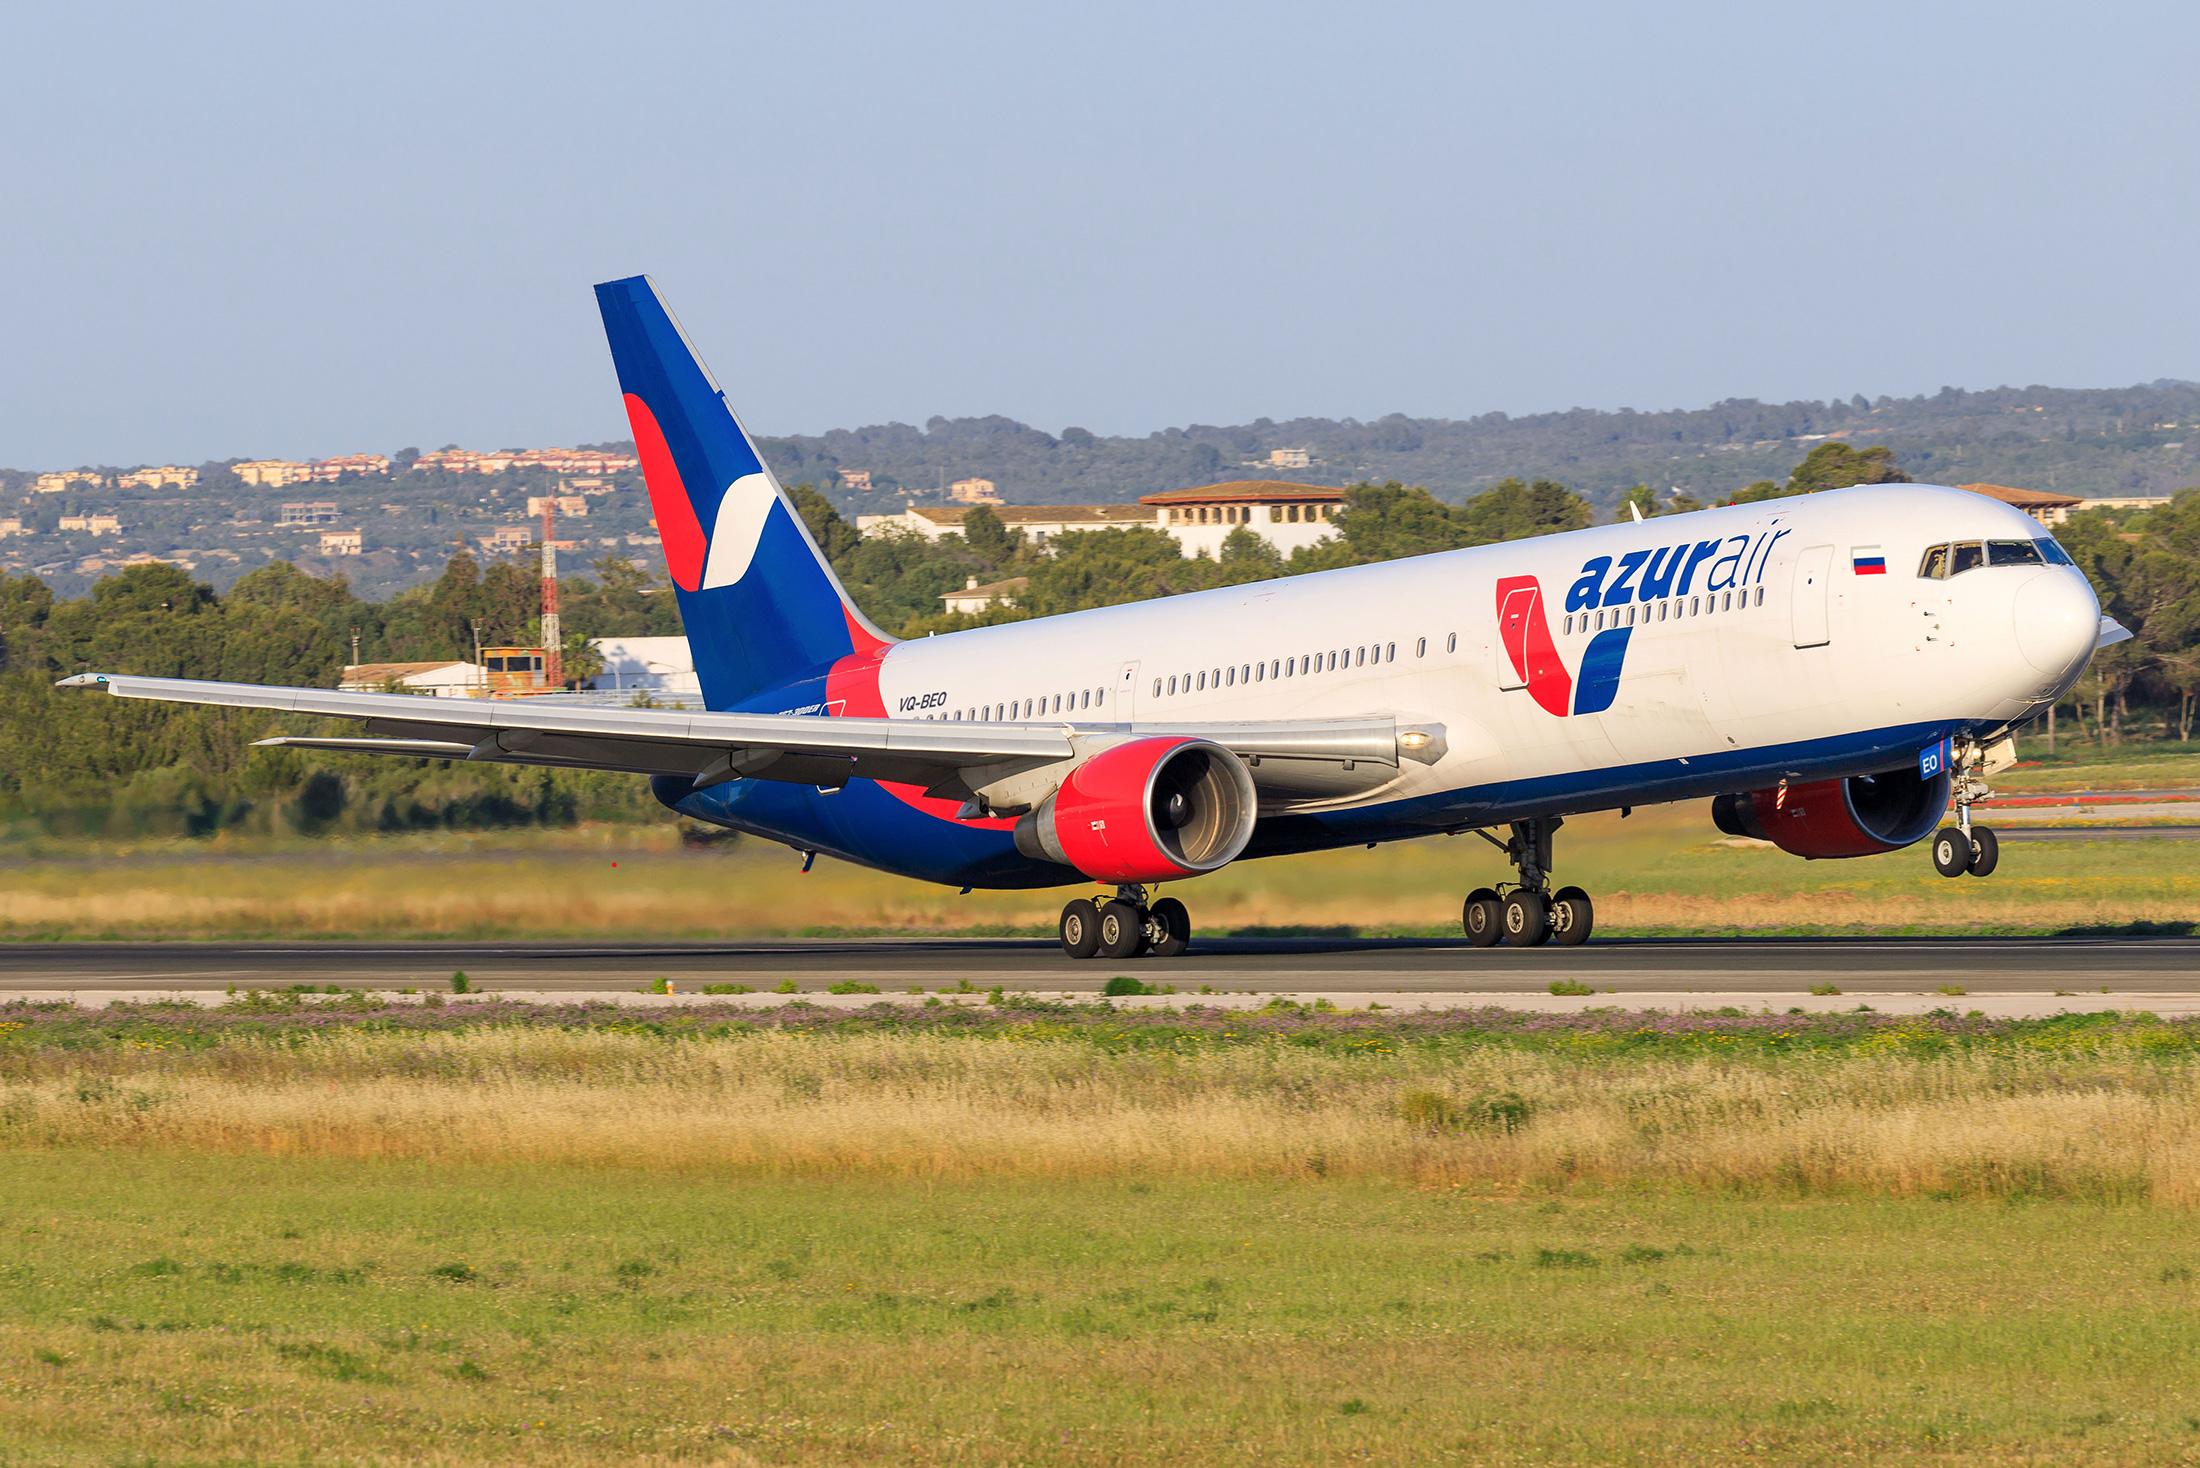 AZUR air получила одиннадцатый Boeing 767–300 всвоём парке